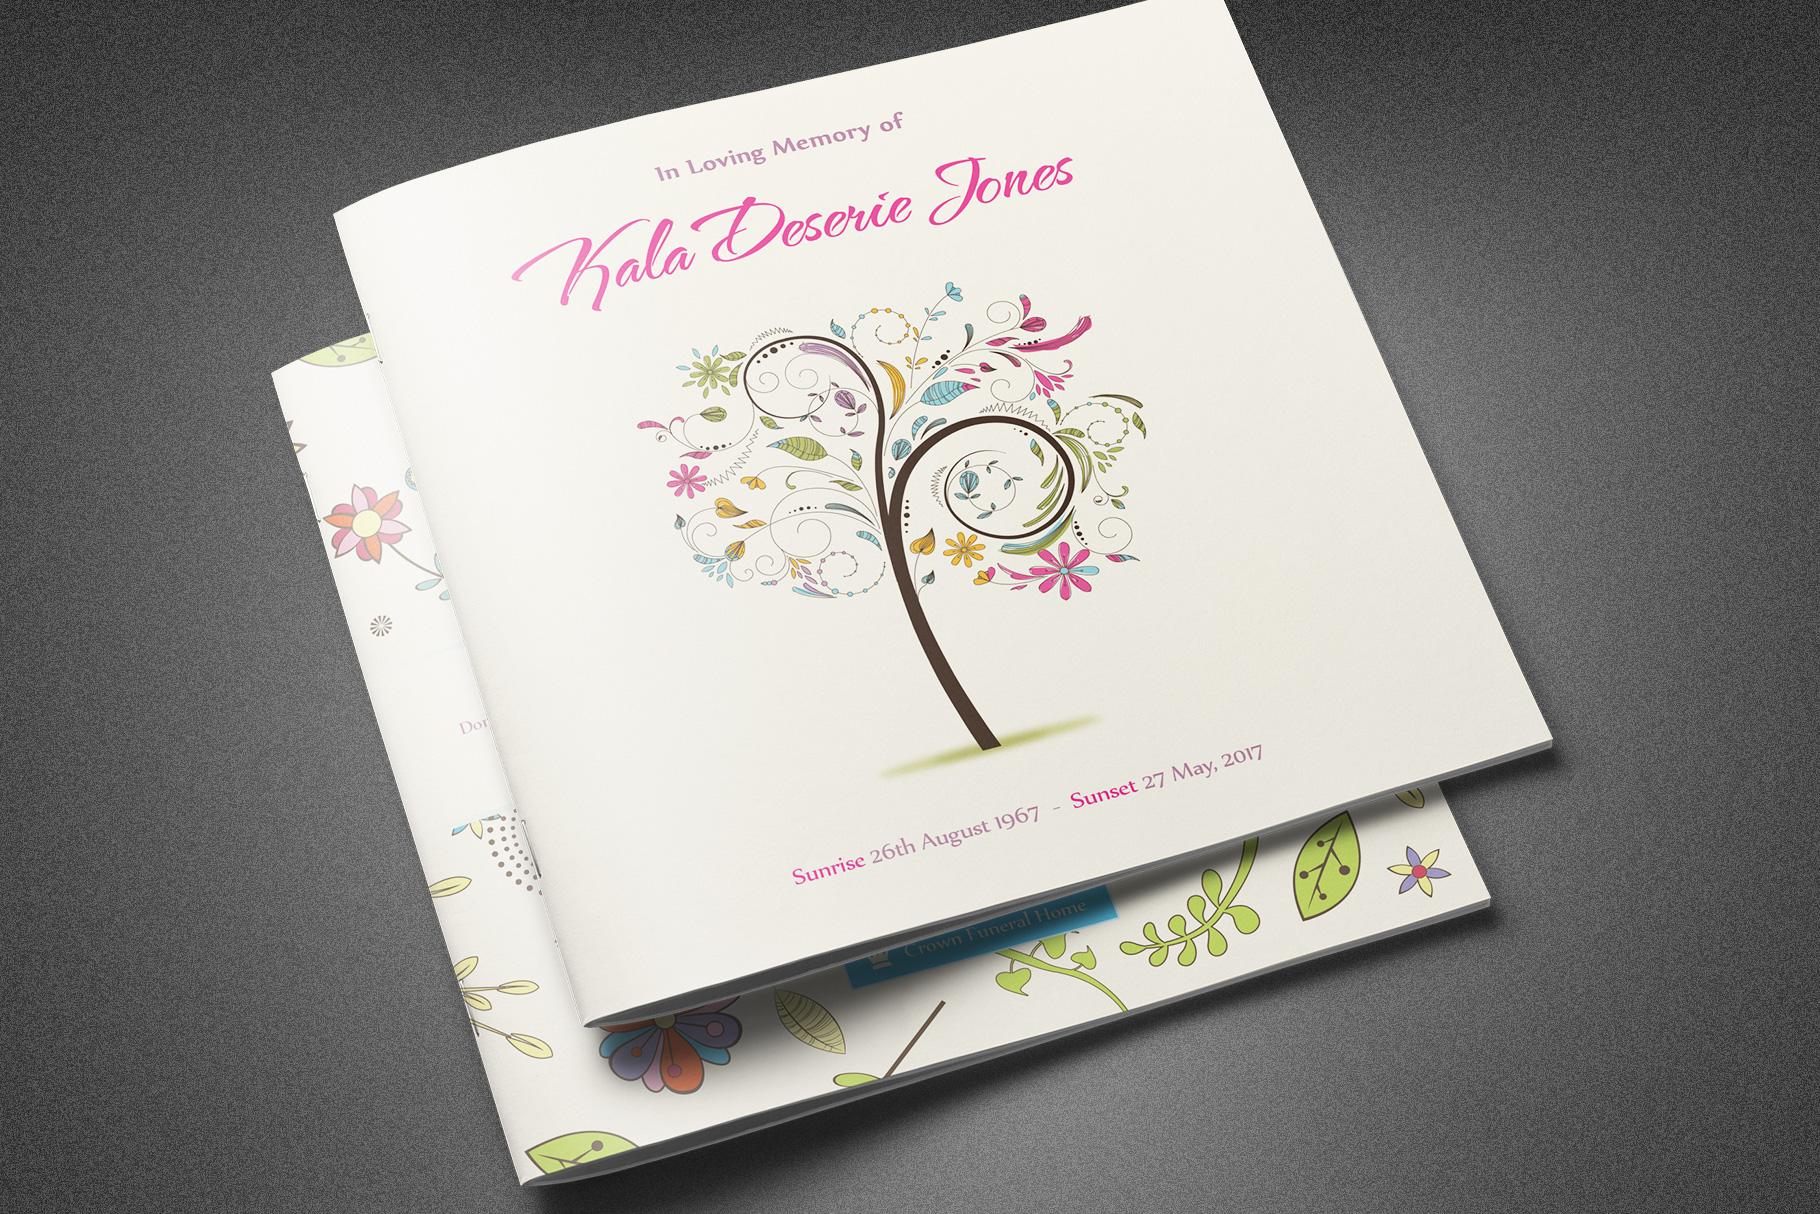 Floral Dreams Funeral Program example image 1